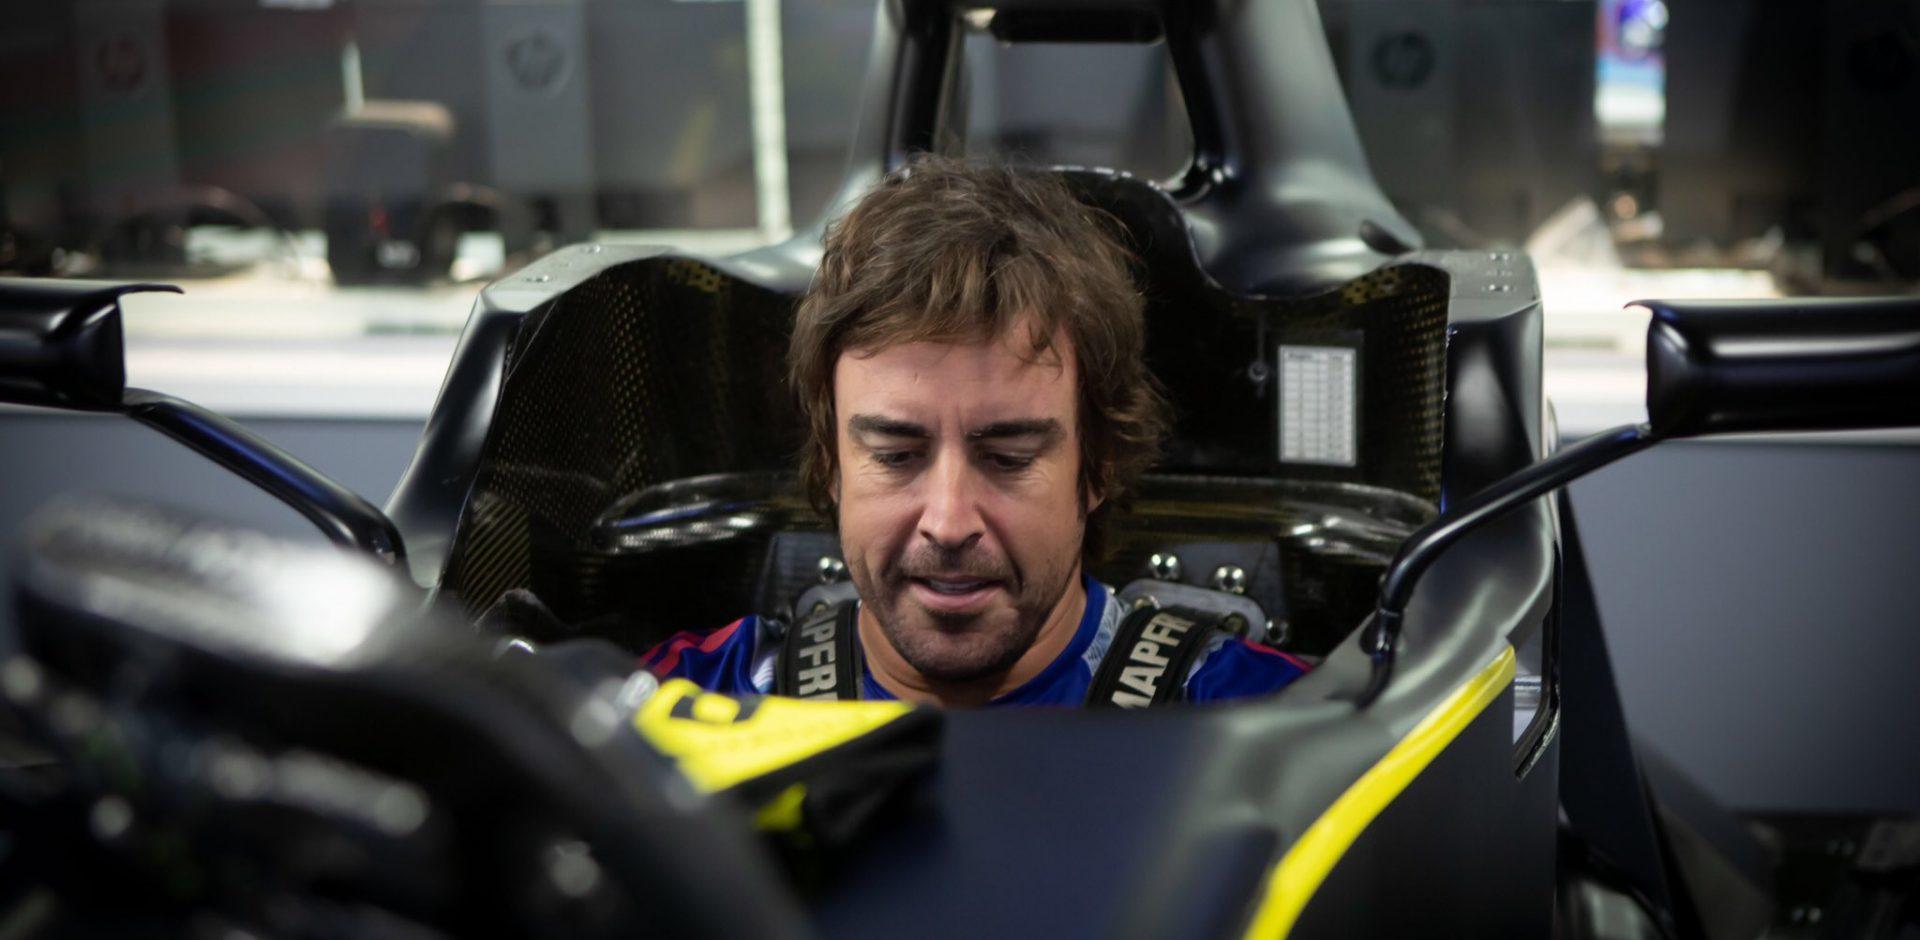 Fernando Alonso, Renault, Seat Fit